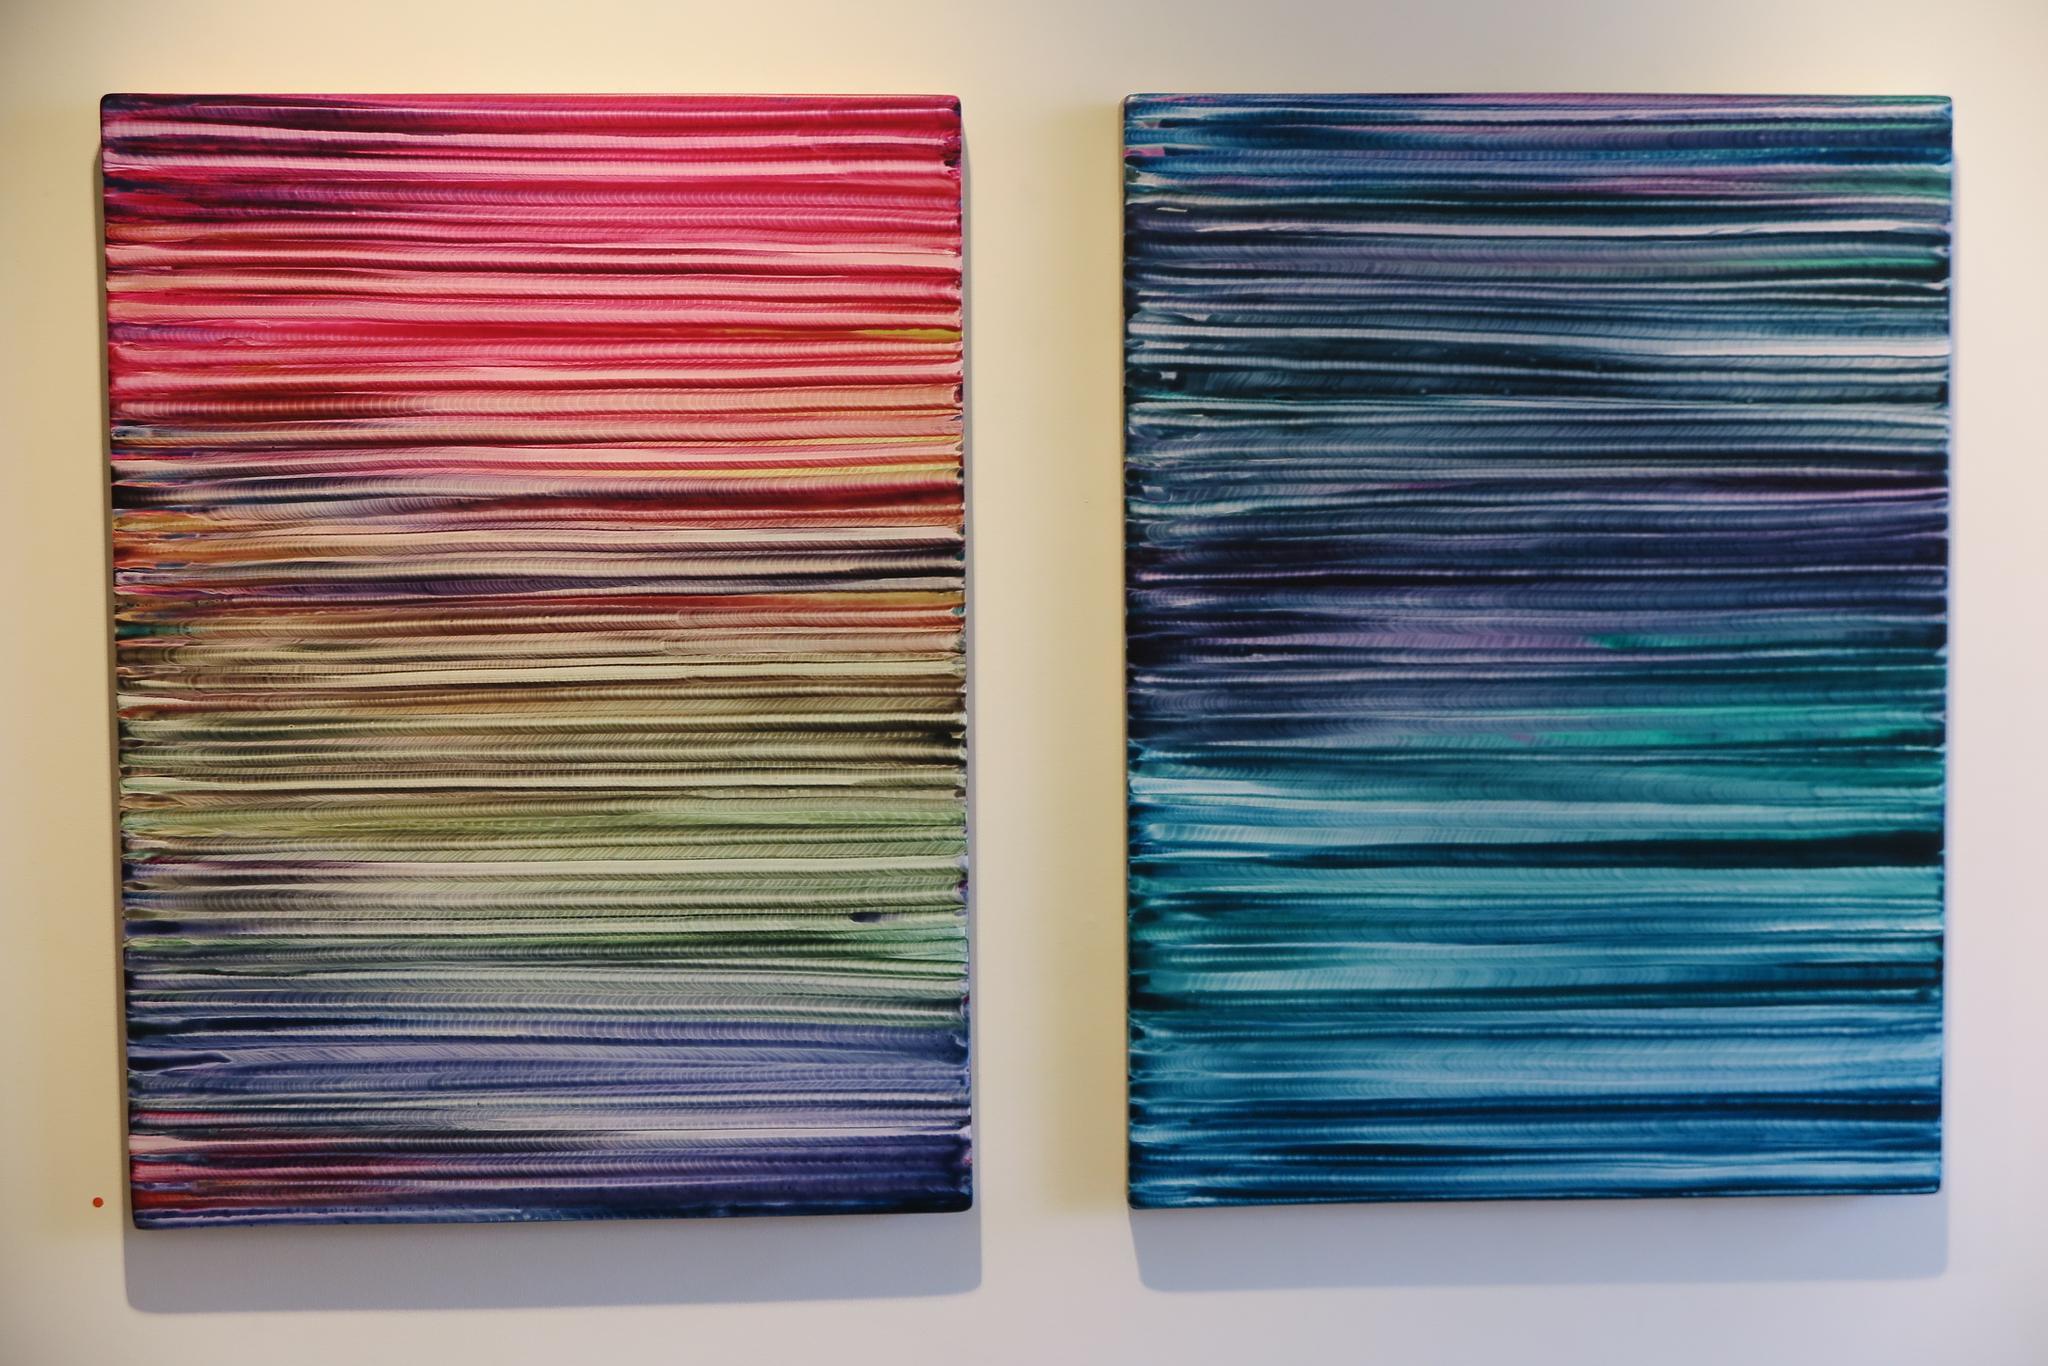 Rob Bouwman - C&H gallery